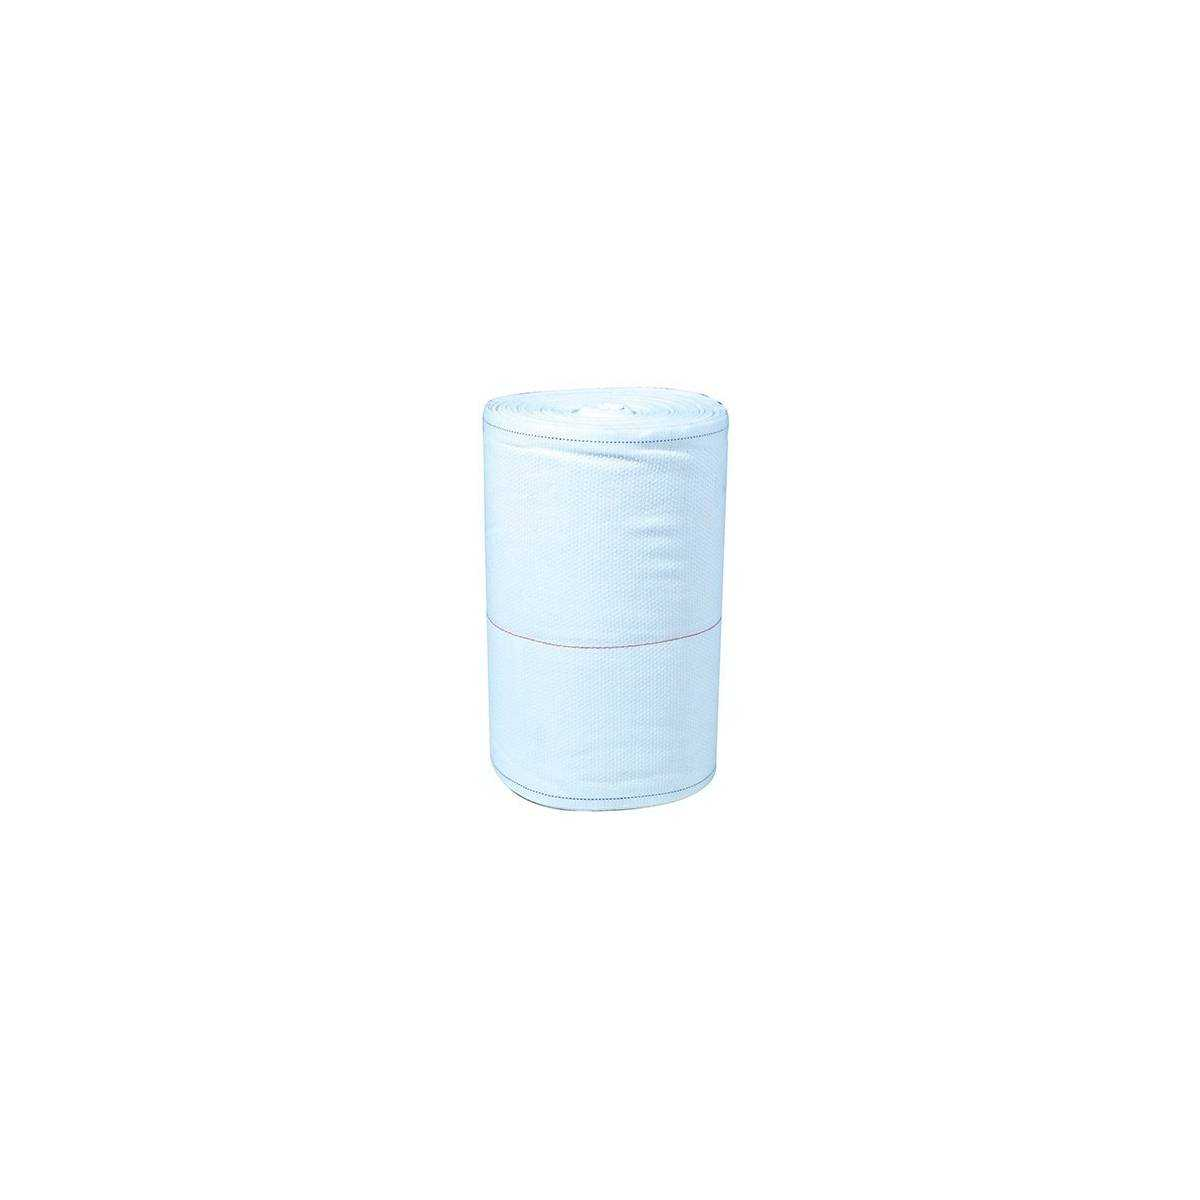 Полотенца рулонные тканные (A99711) A99711 Mar Plast